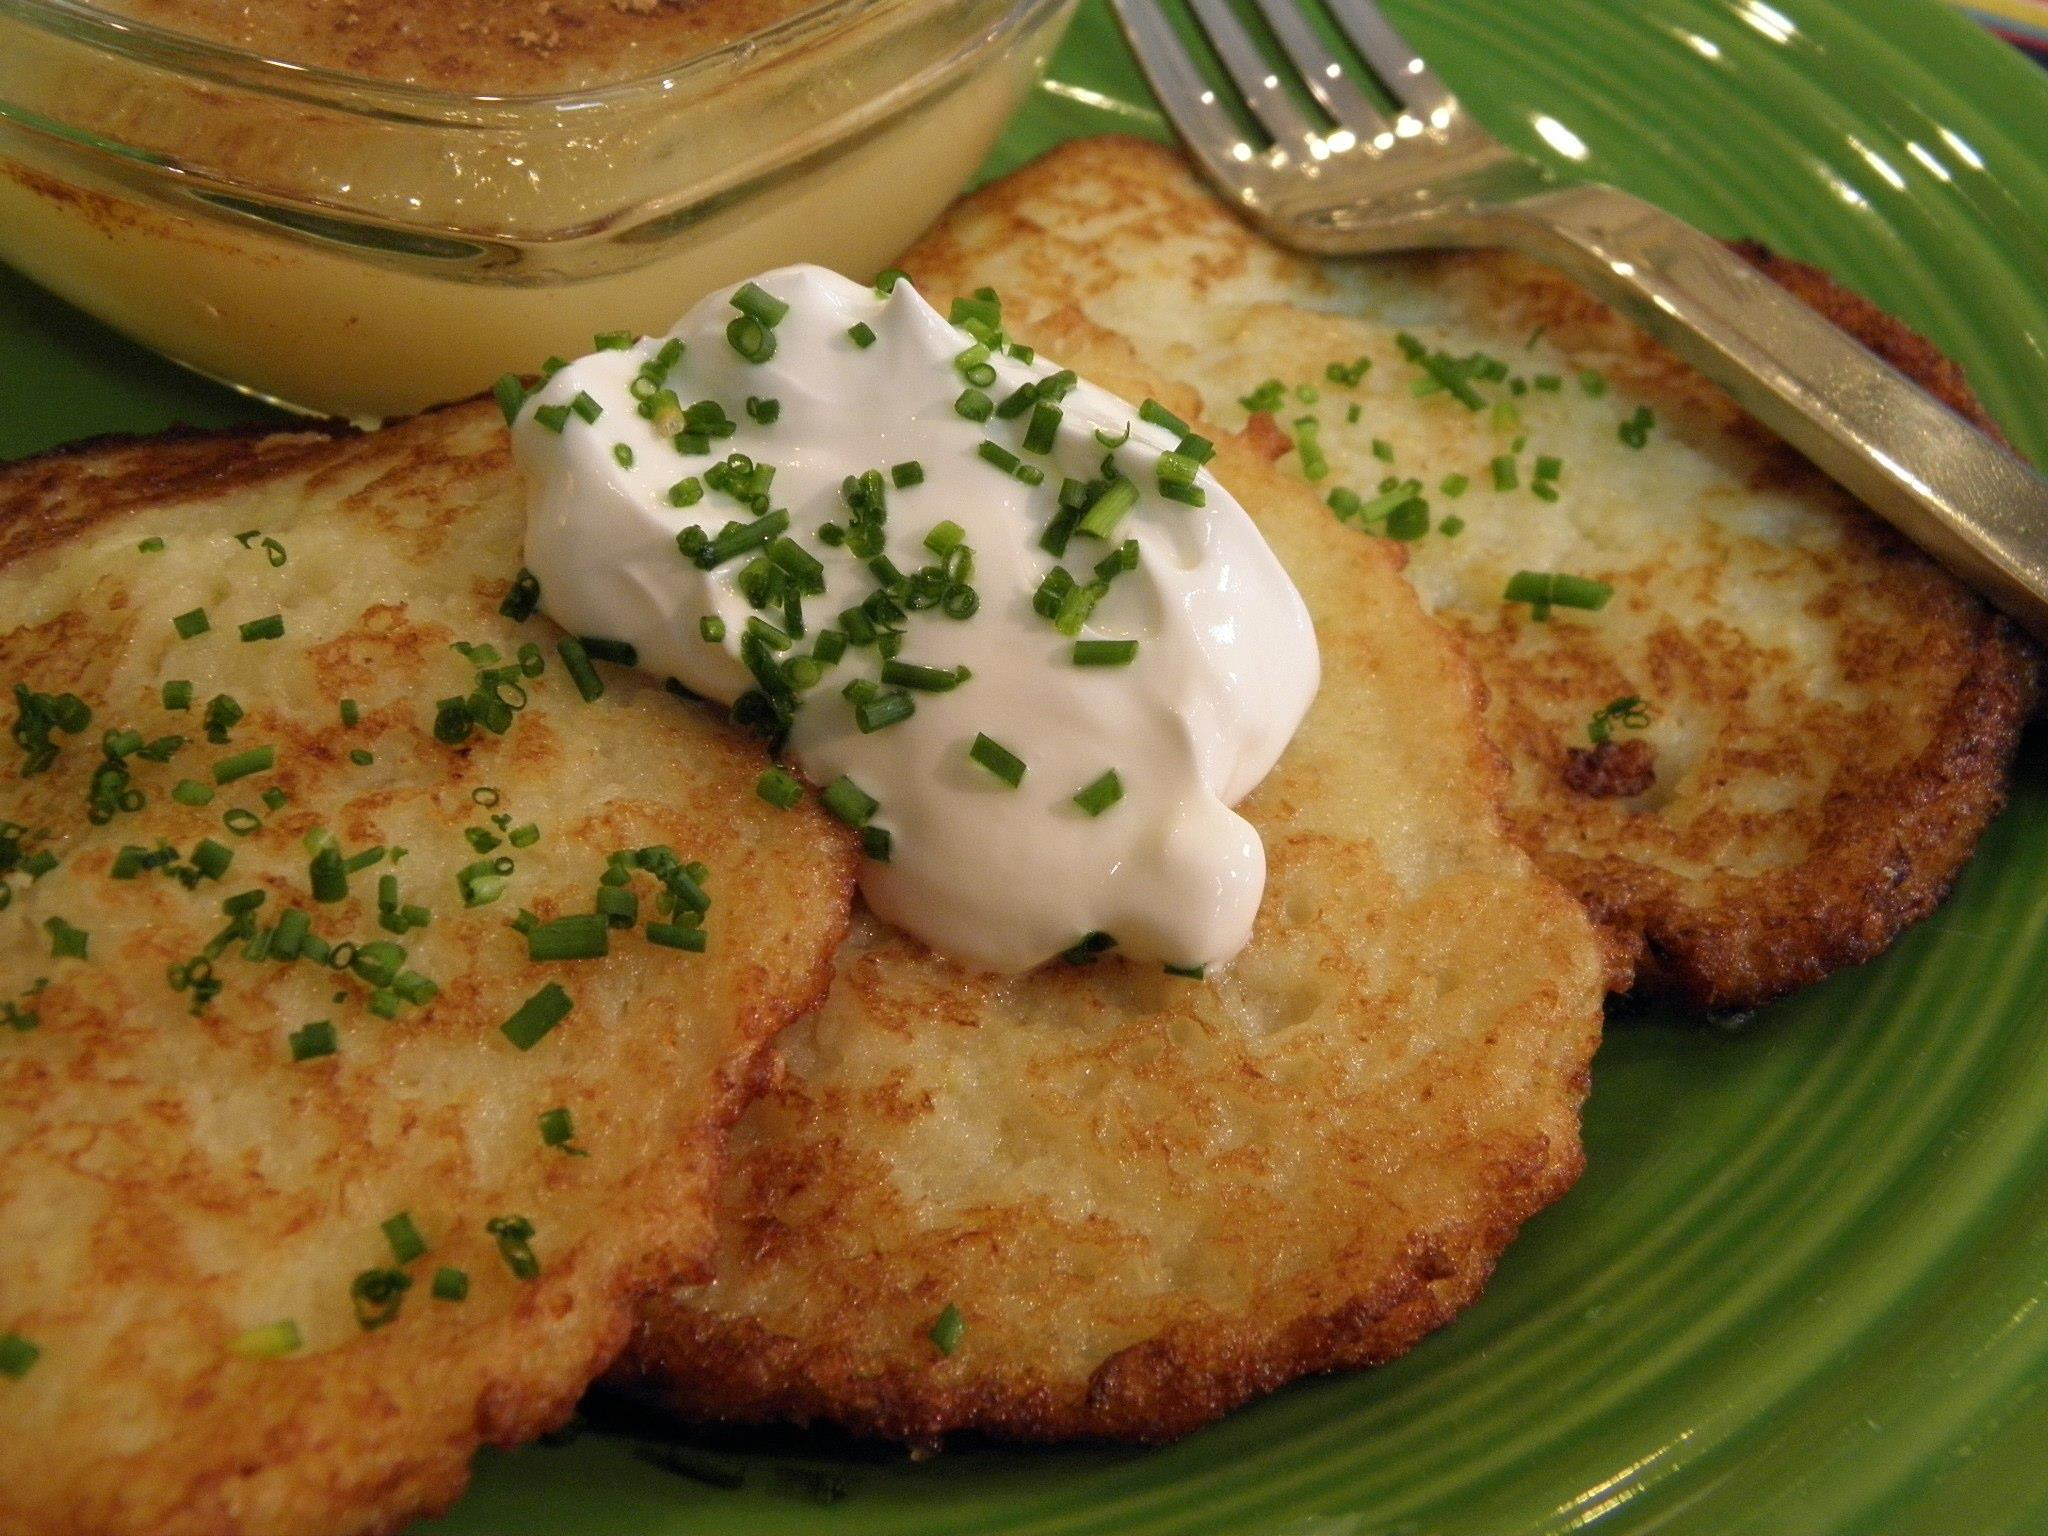 Homeplate: Helga Wengler's Potato Pancakes (Kartoffelpuffer)